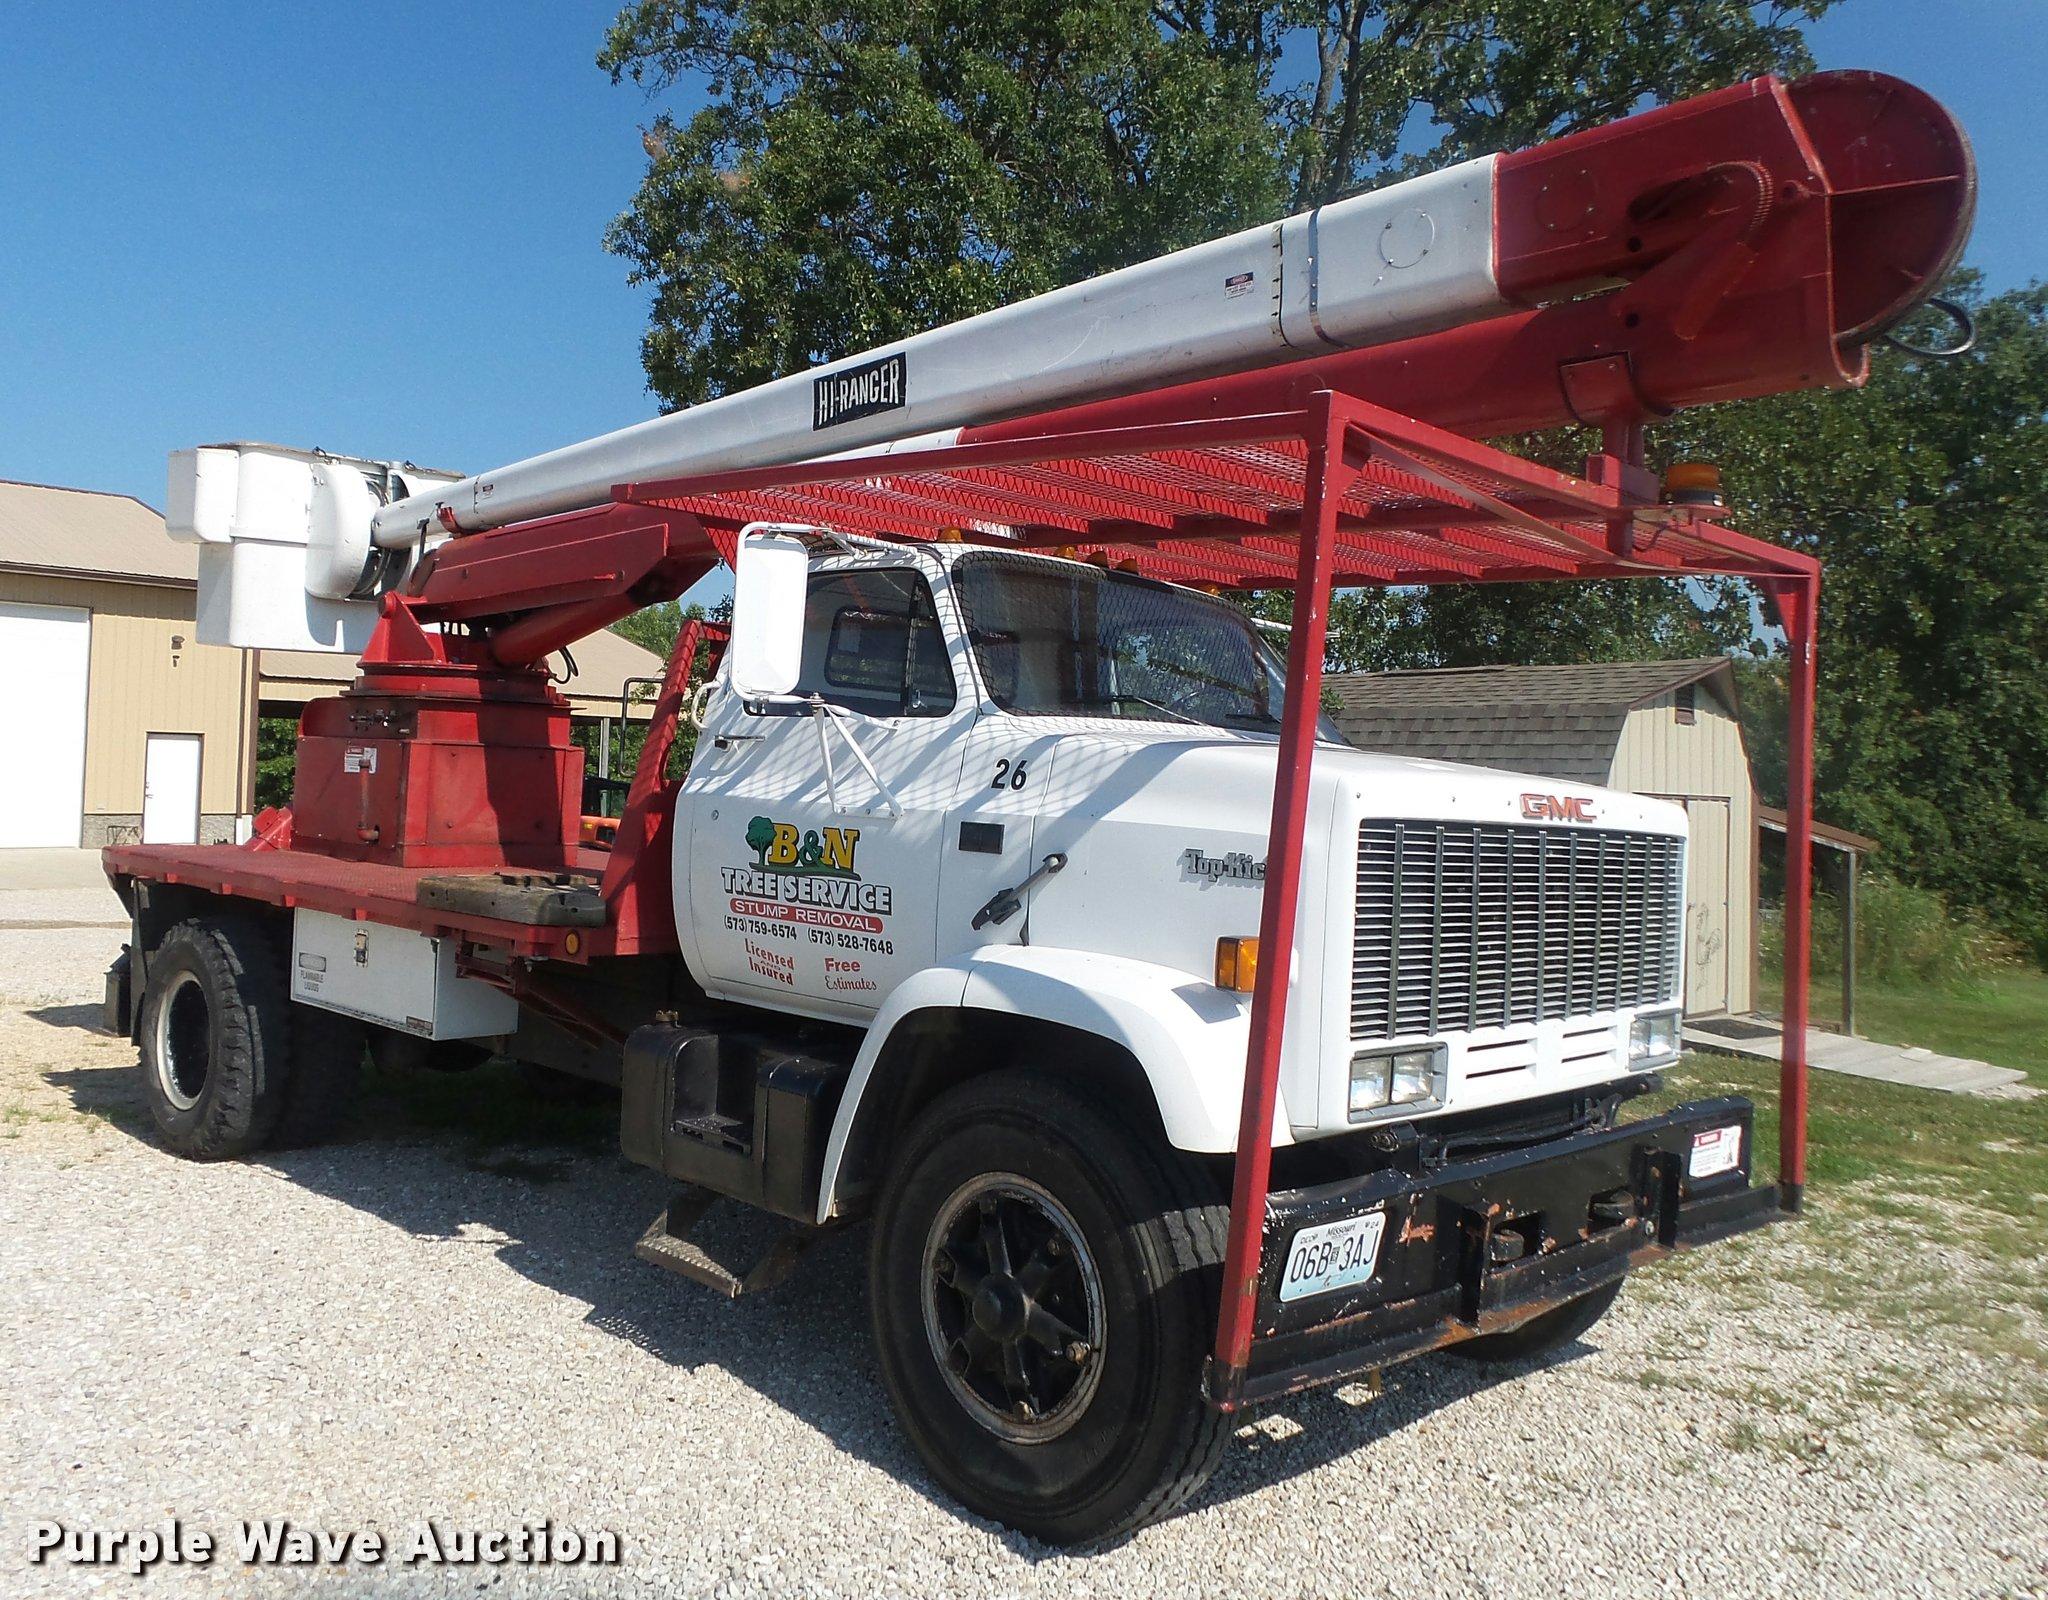 ... GMC TopKick 7000 bucket truck Full size in new window ...